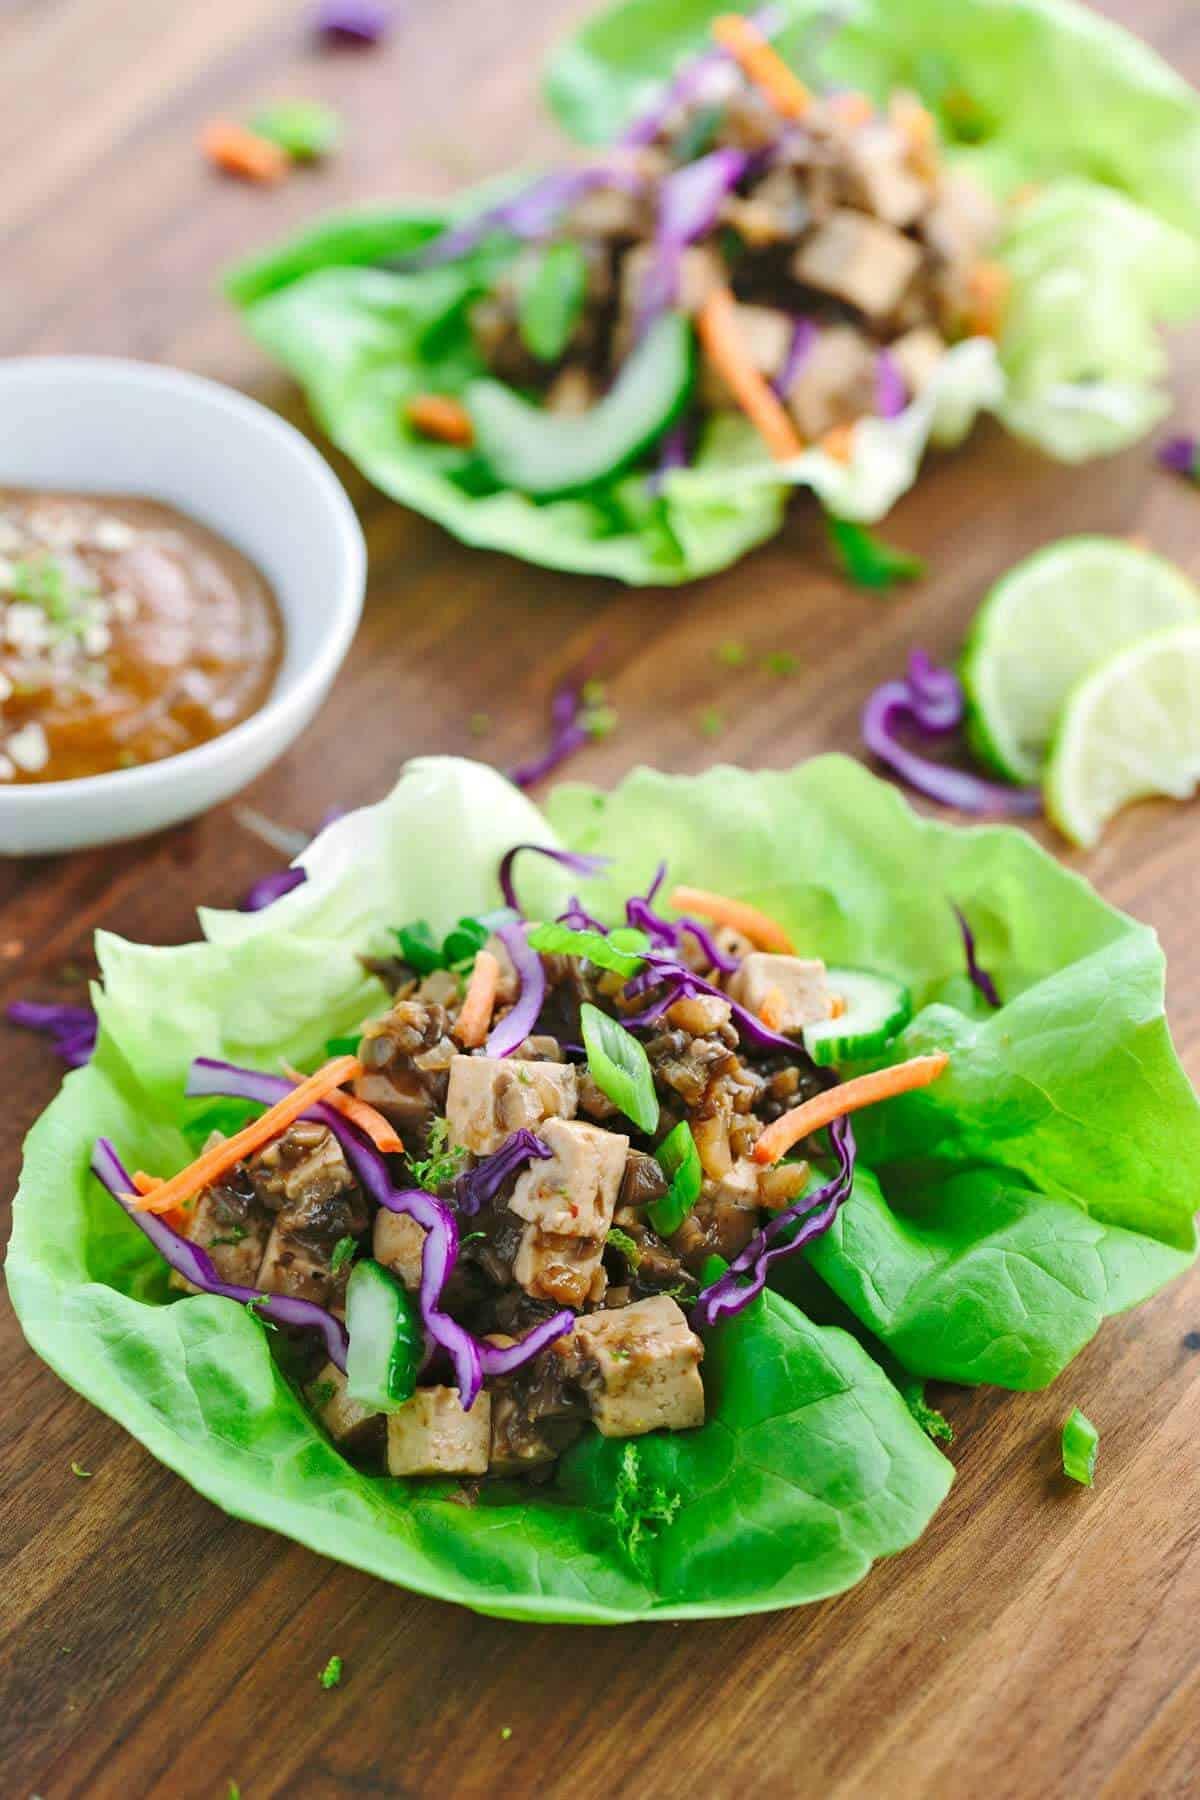 Asian Vegetable Lettuce Wrap with Peanut Sauce